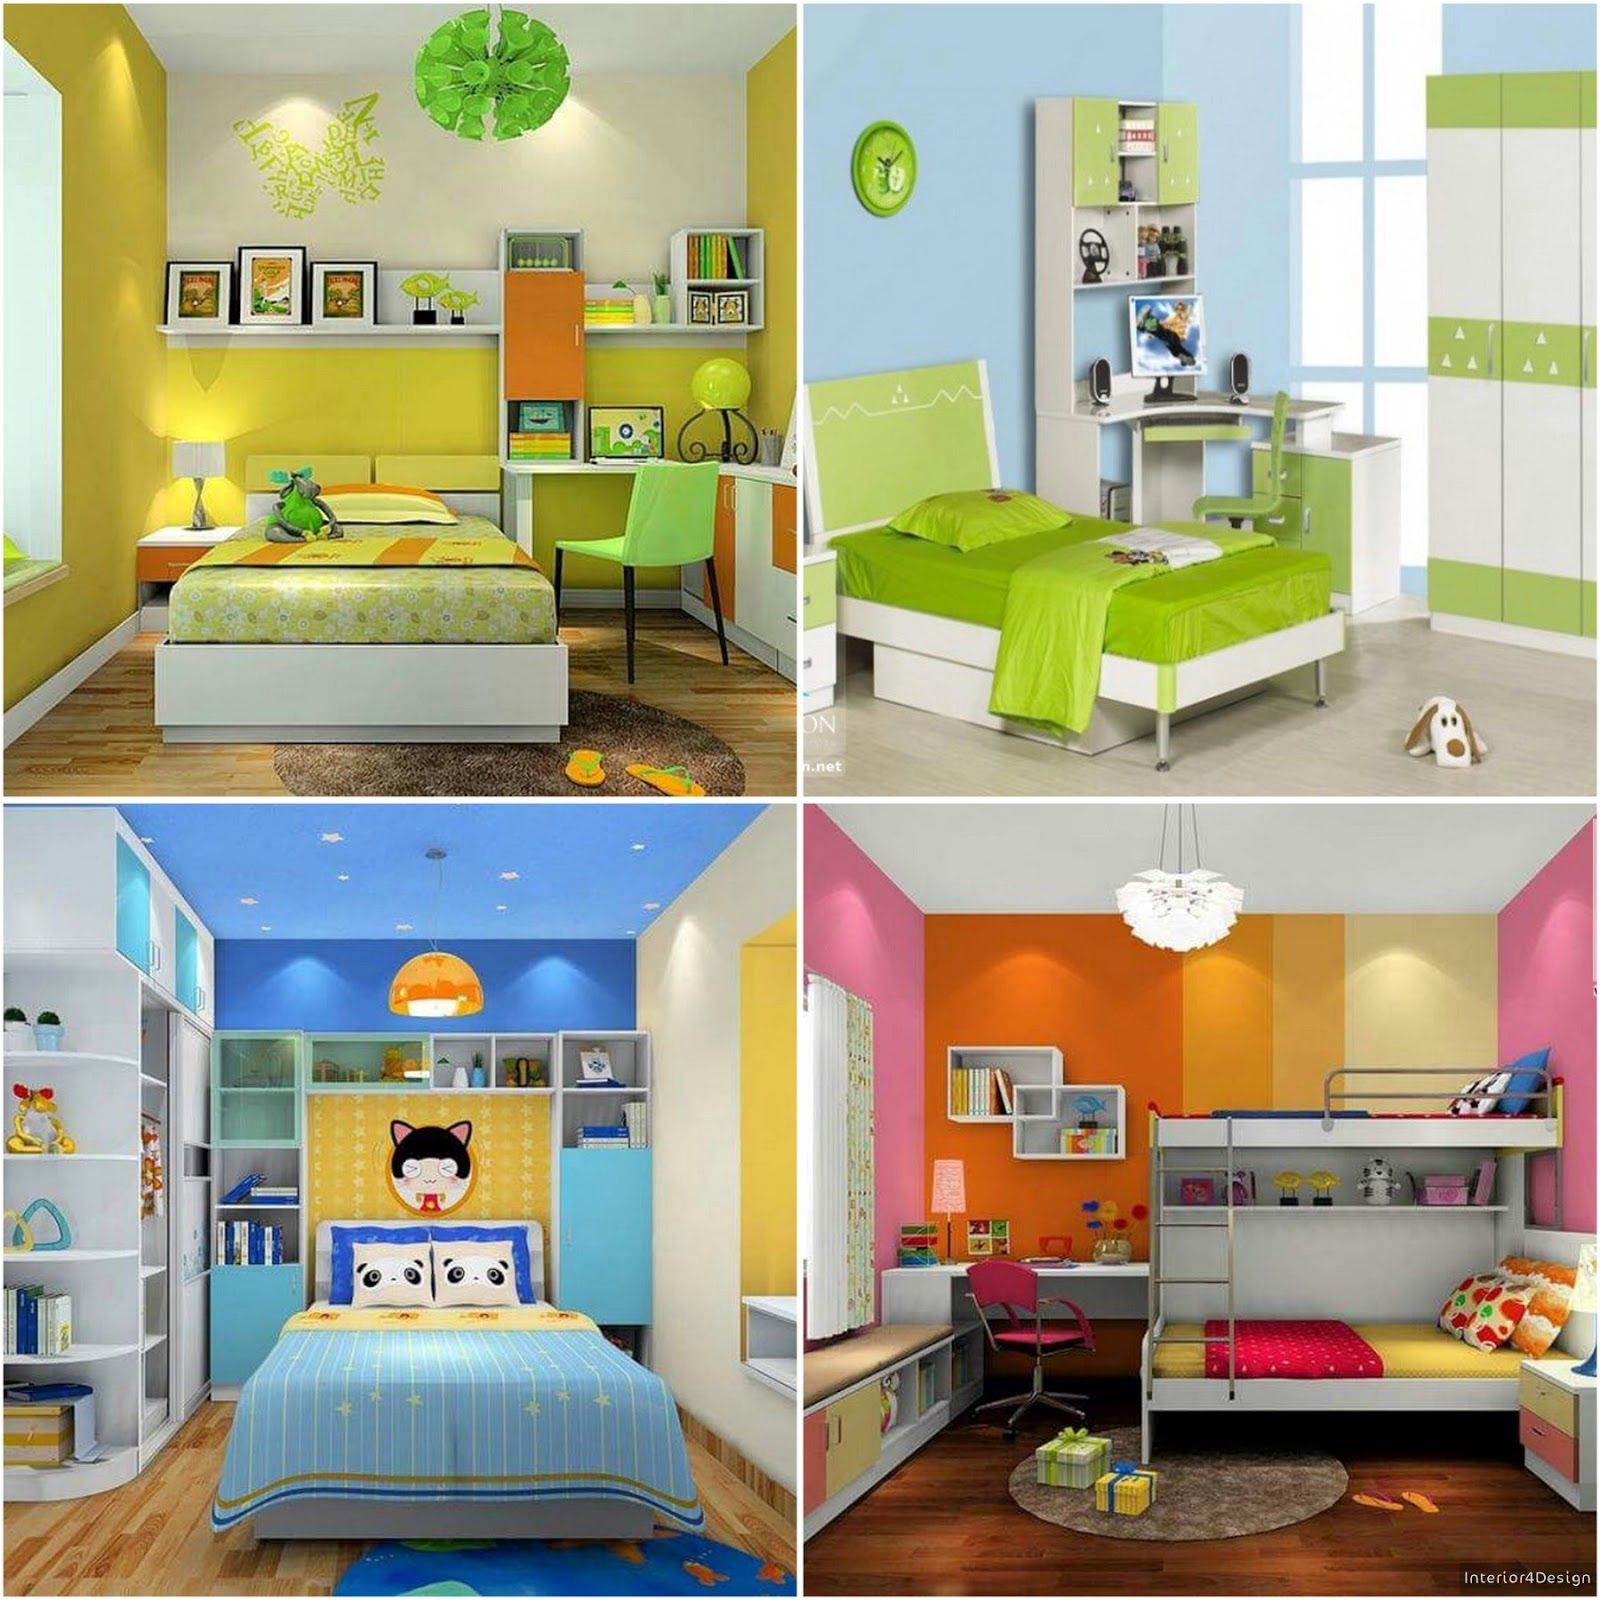 Latest Design Of Kids Room 2019 - Alphahabit.store • Alphahabit.store